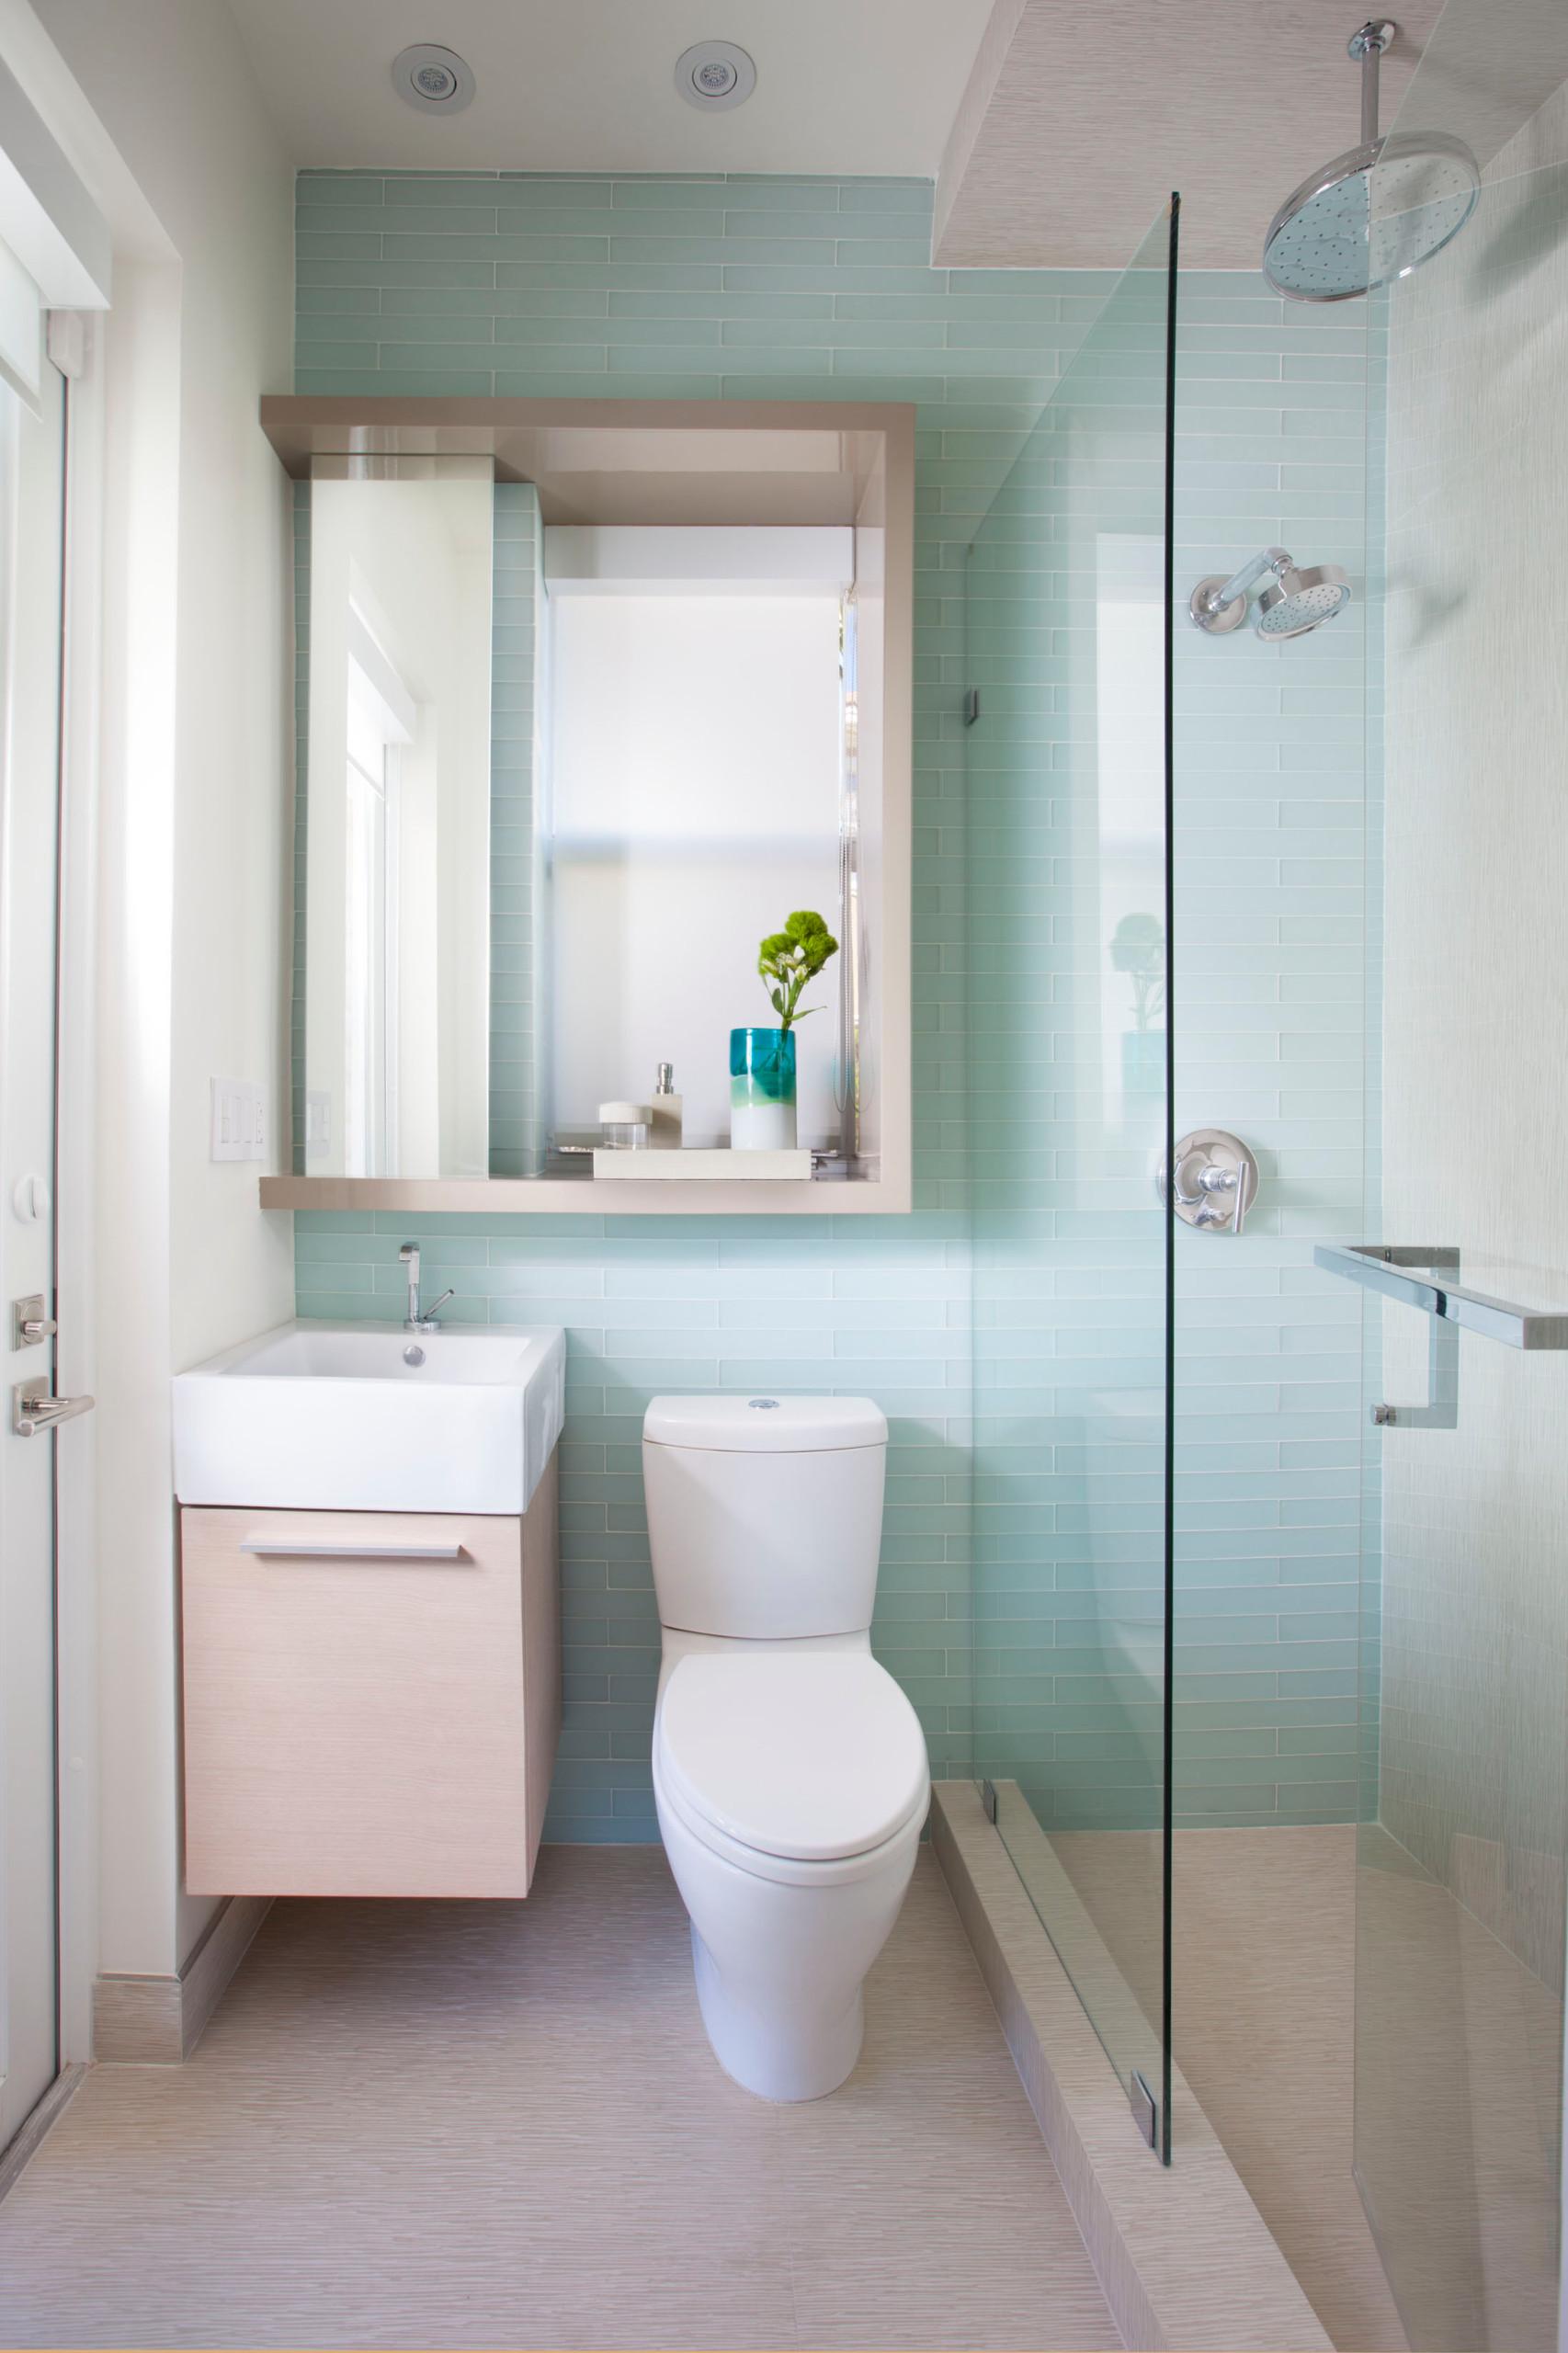 Interior Designing In Kerala Bathroom Ideas & Photos  Houzz